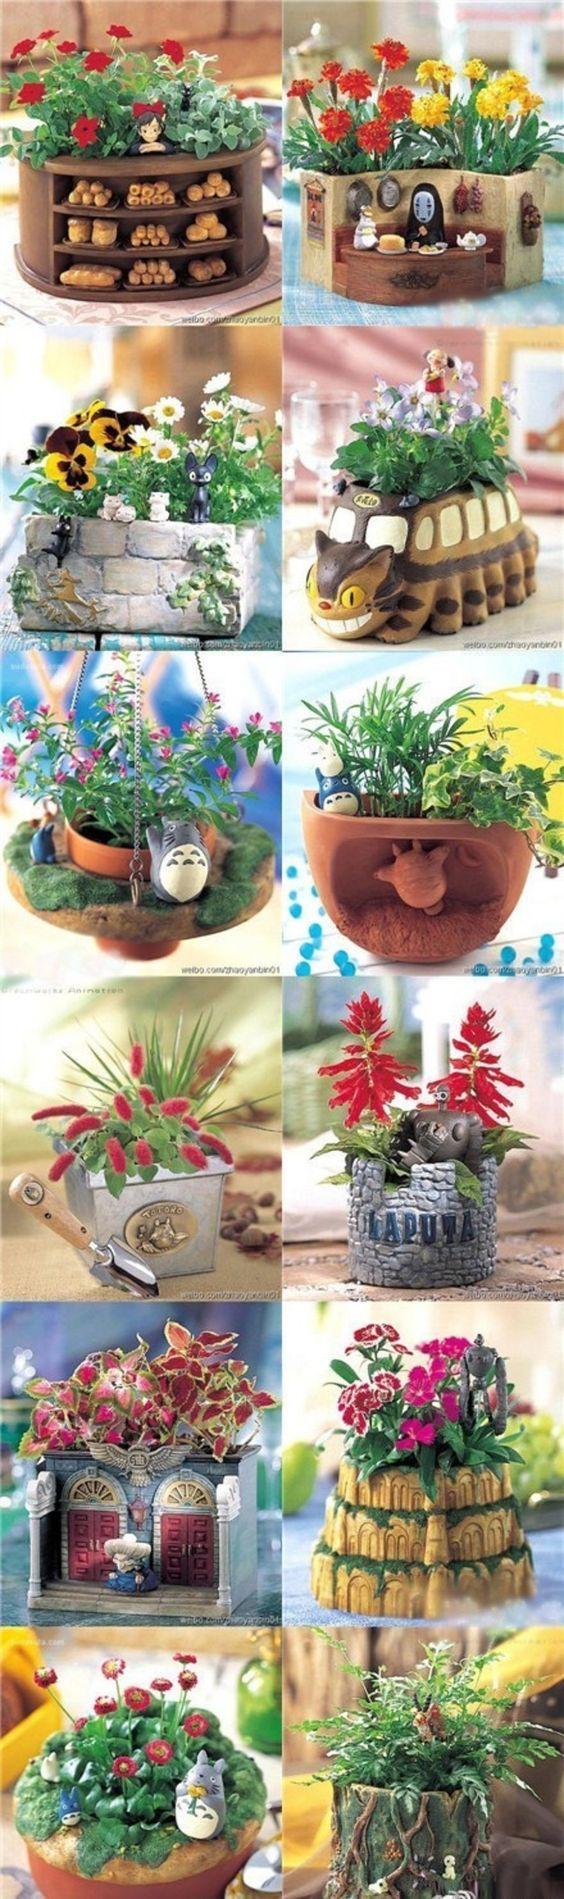 How incredibly cute & creative!!!